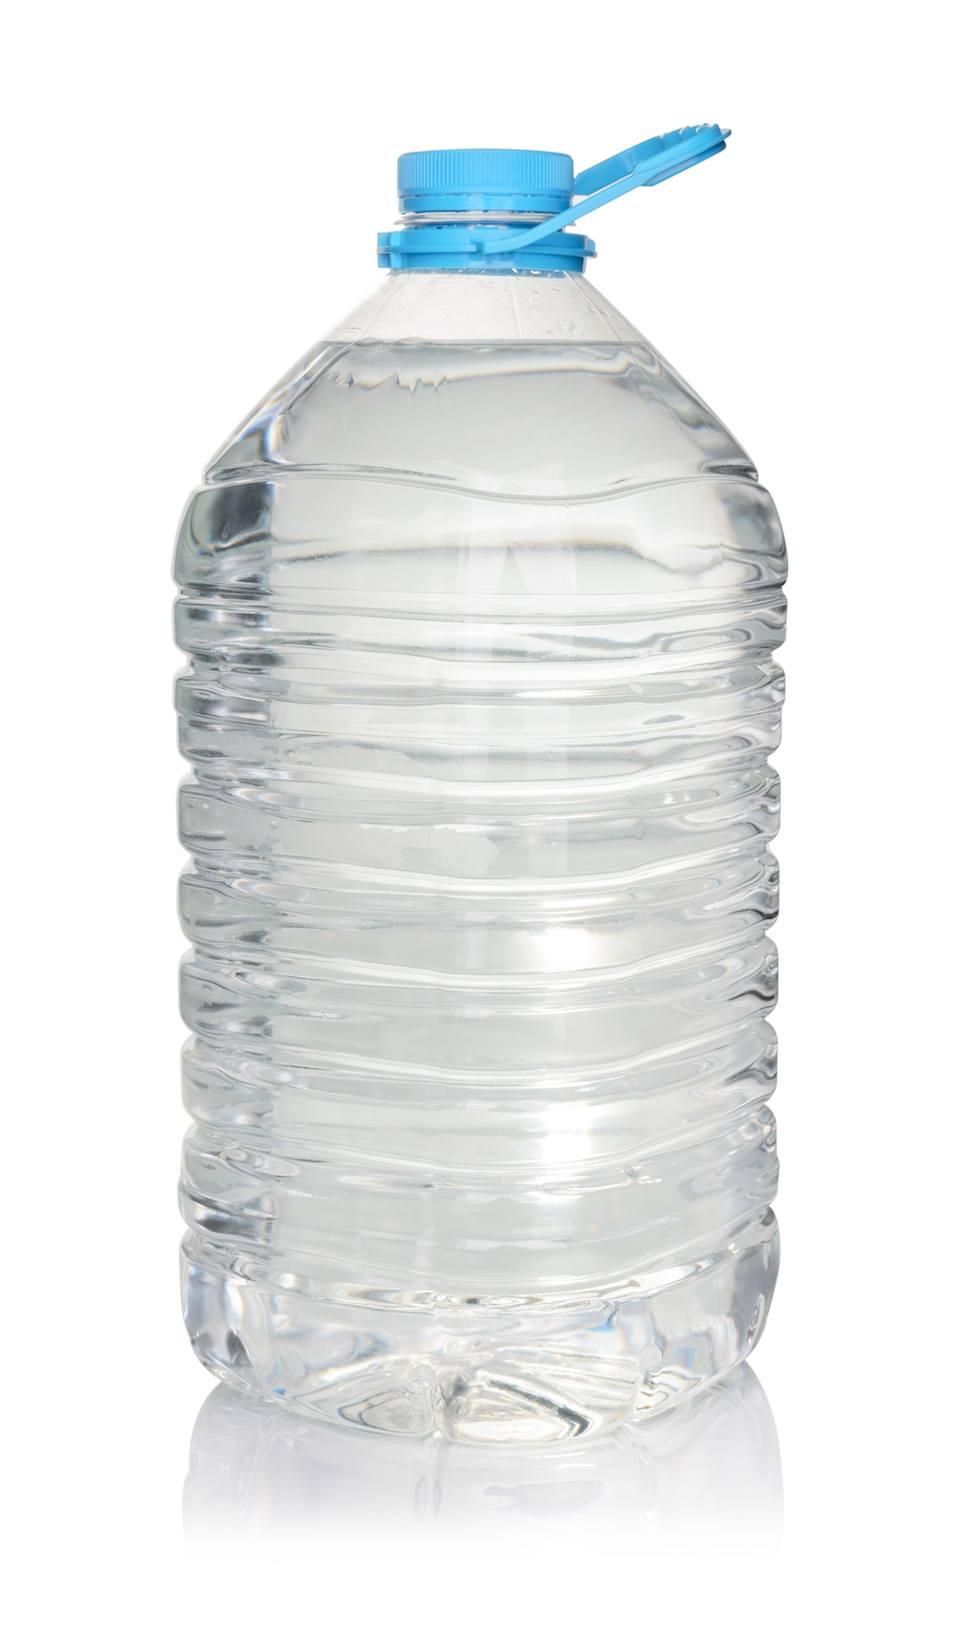 Plastic bottle of drinking water